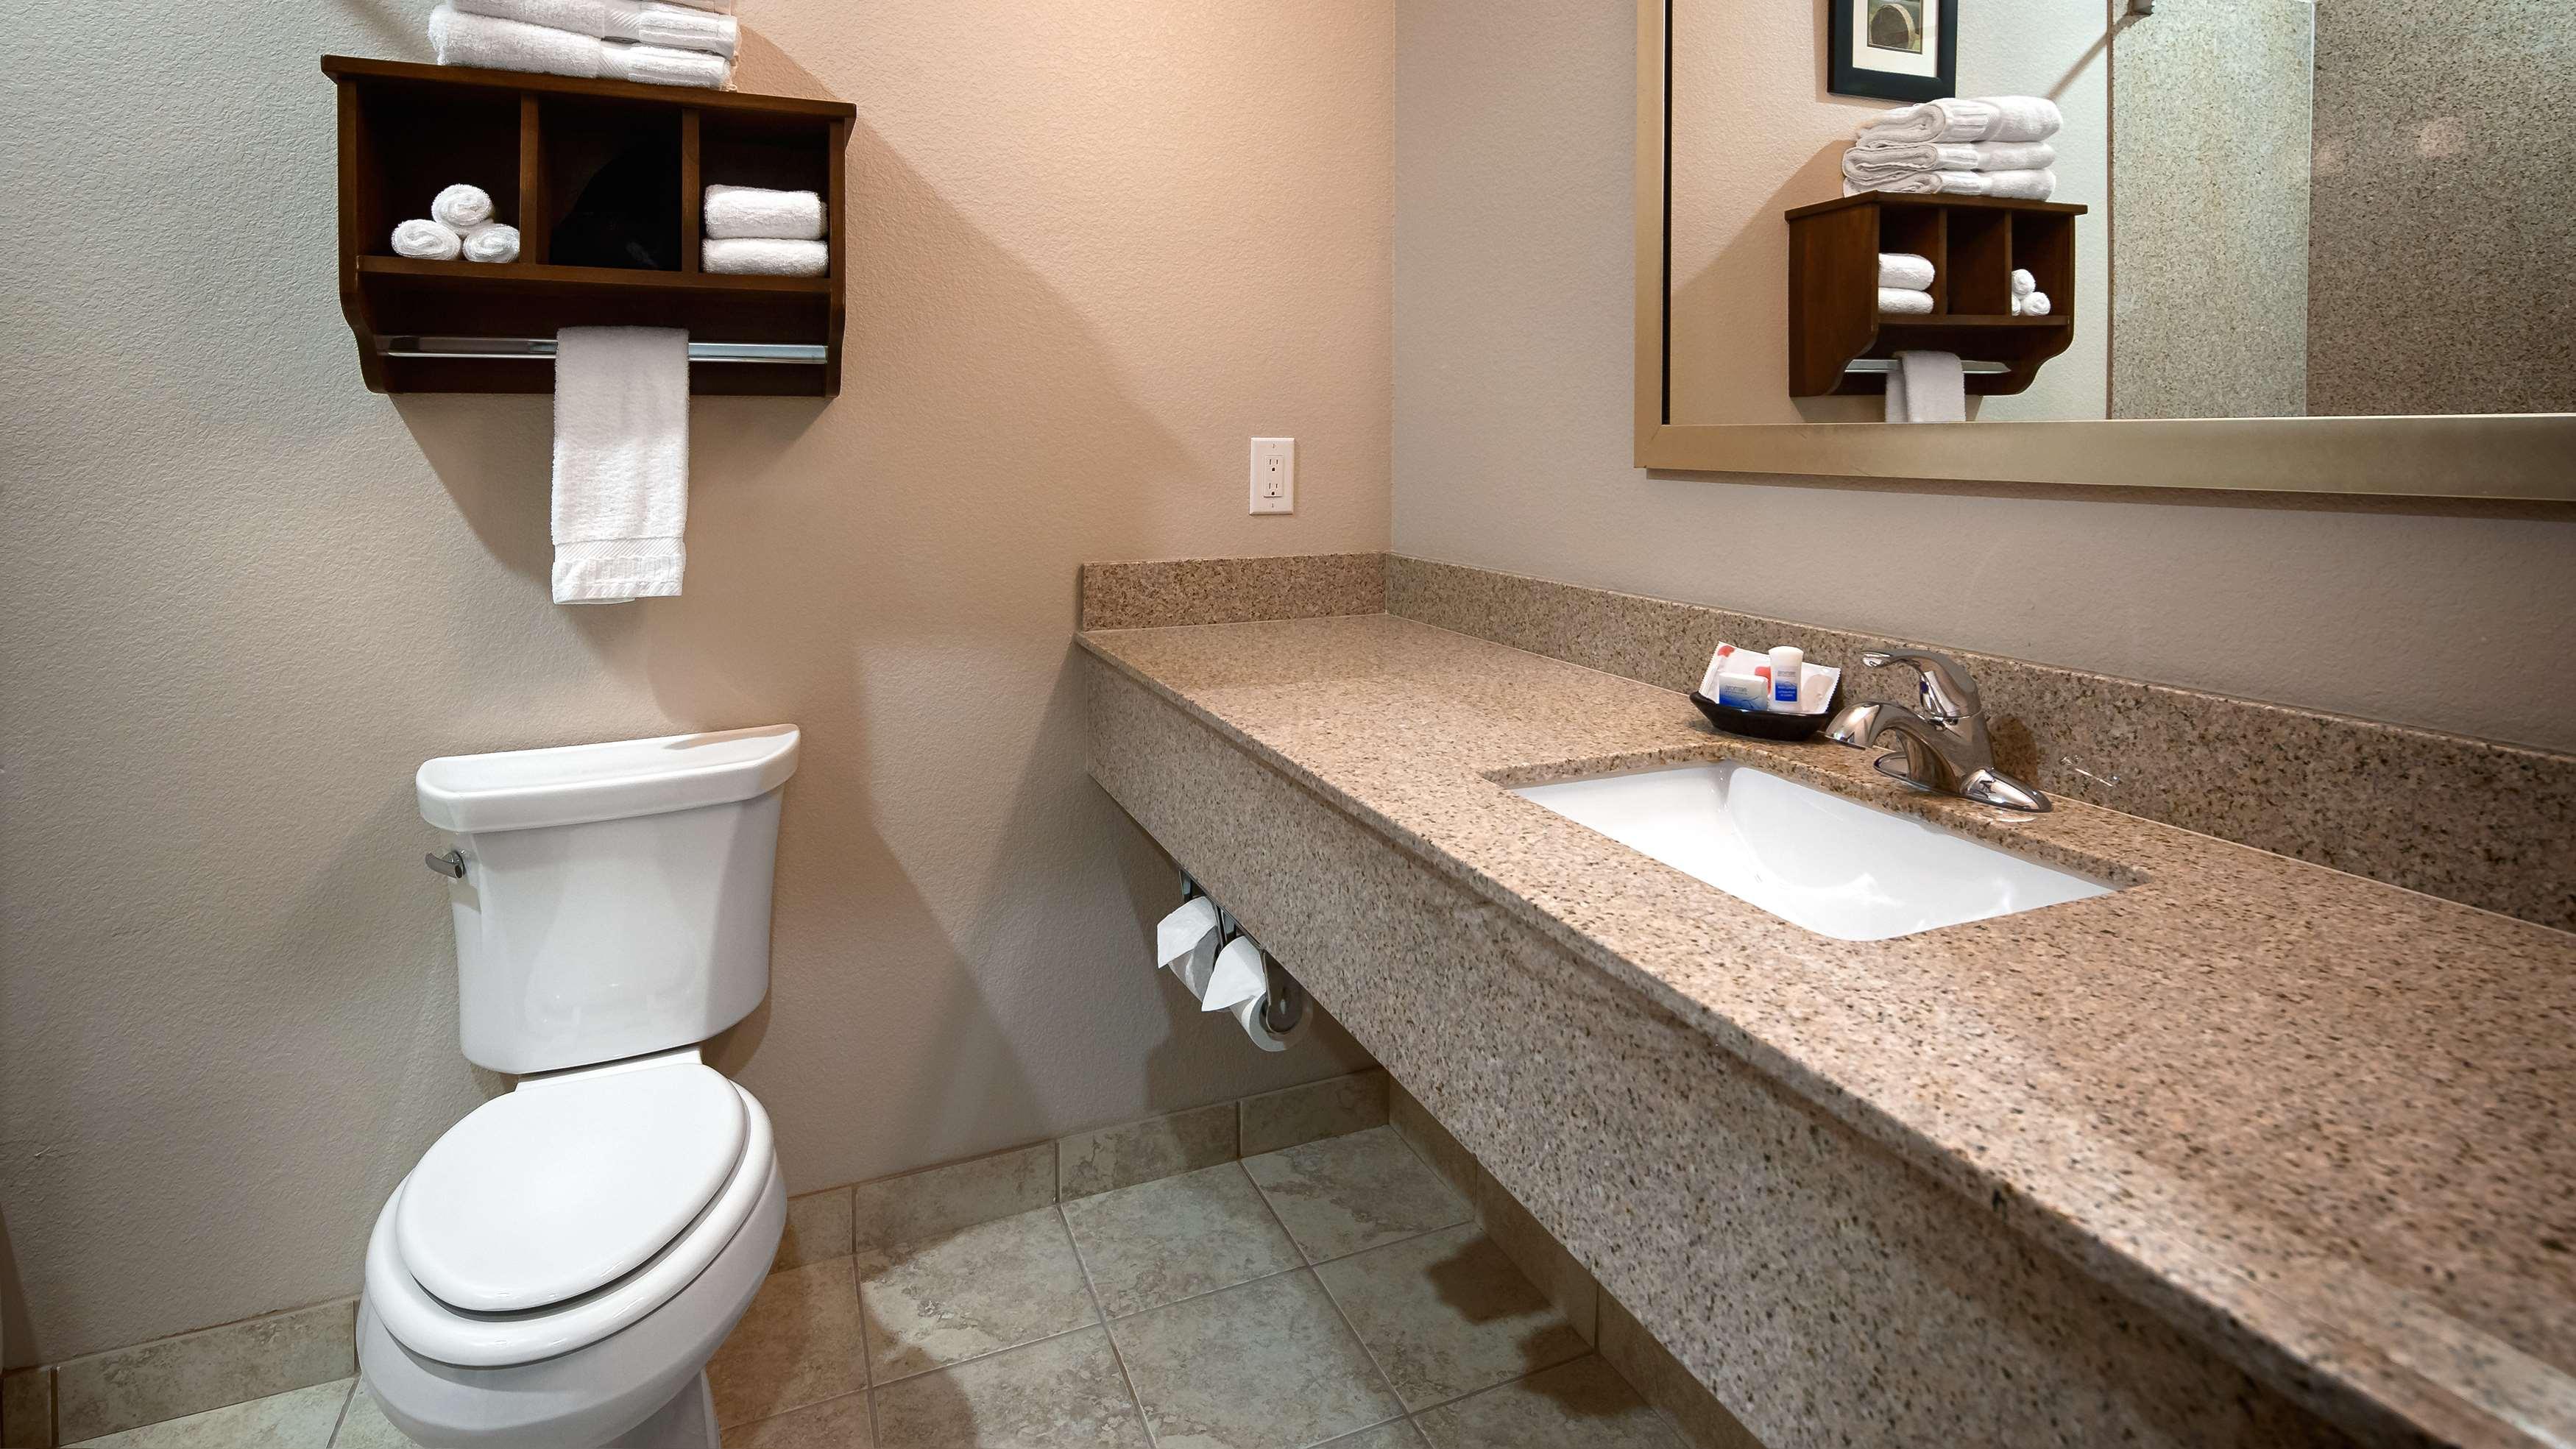 Best Western Plus Denver City Hotel & Suites image 12